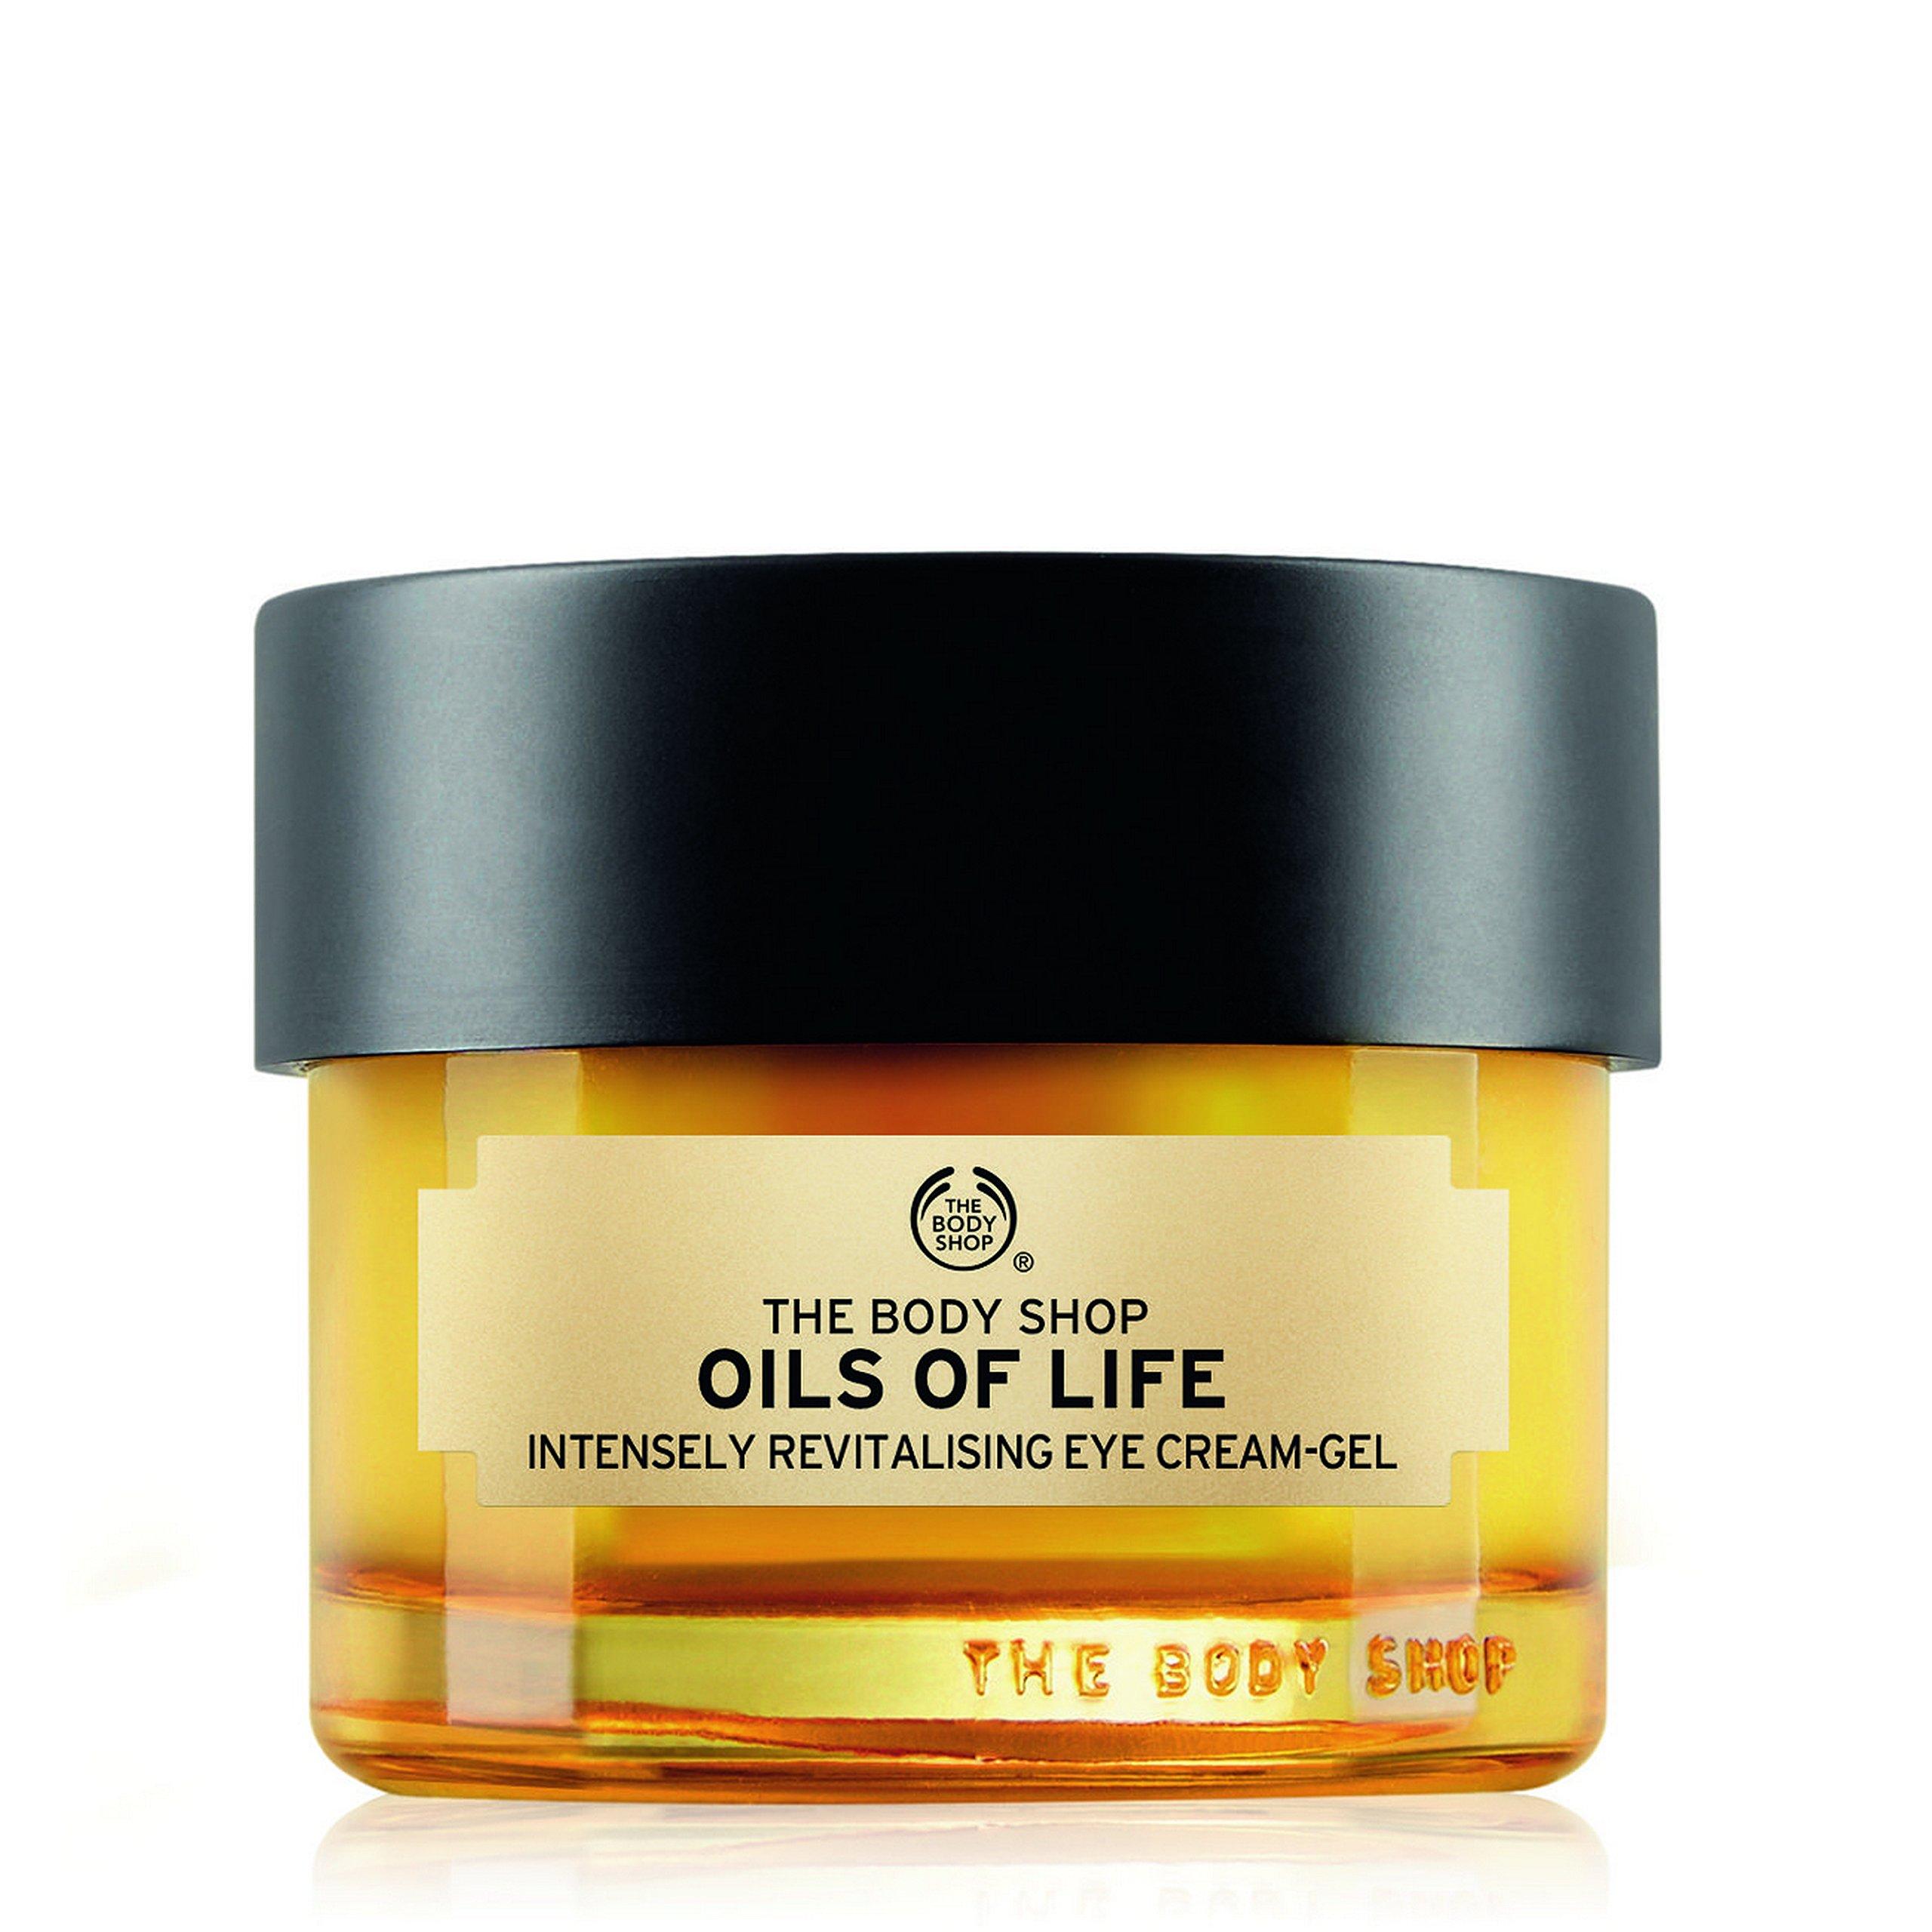 The Body Shop Oils of Life Intensely Revitalising Eye Cream Gel, 0.69 oz.